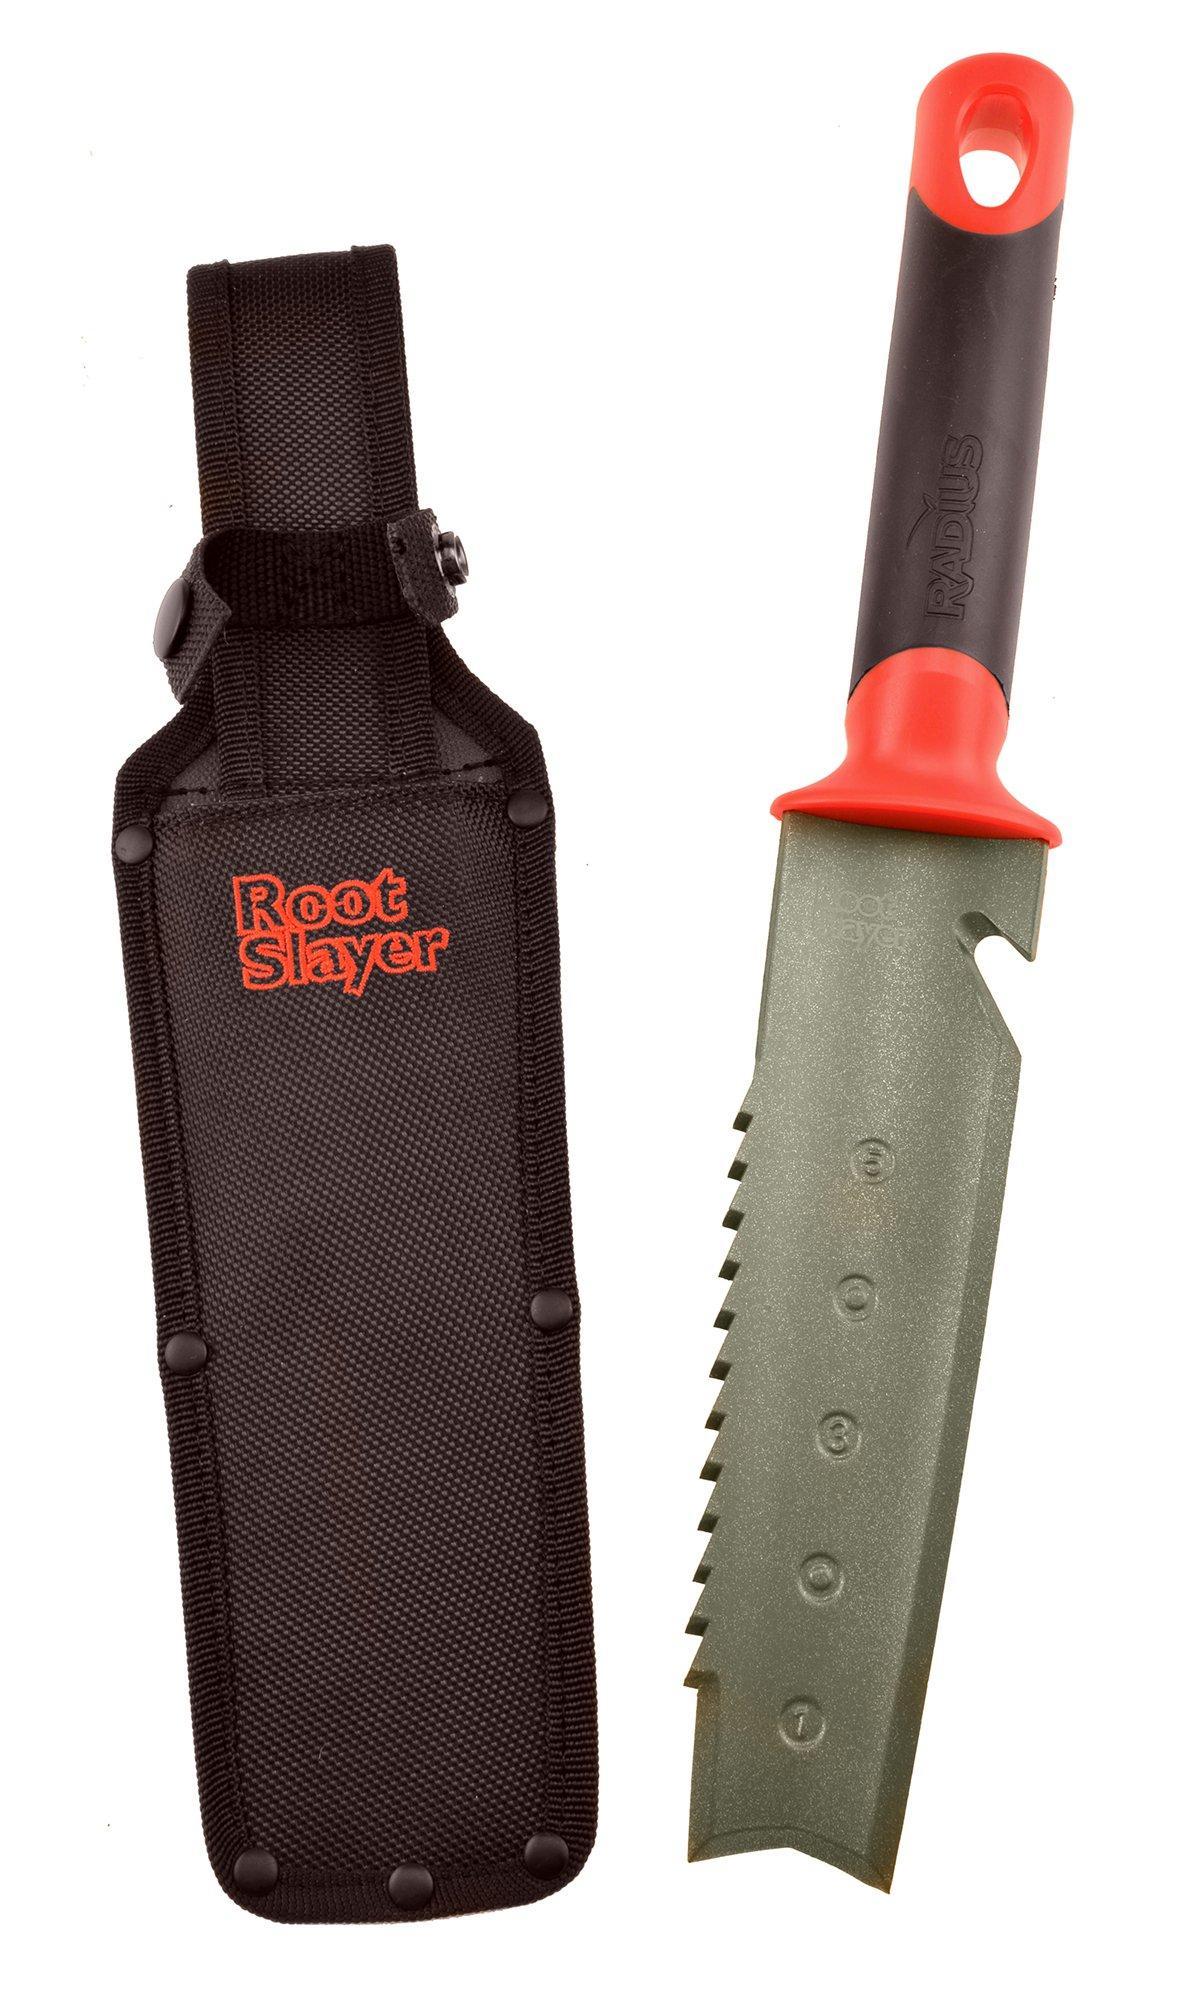 Radius Garden 17211 Root Slayer Soil Knife with Holster, Root Slayer Soil Knife with Holster, Red by Radius Garden